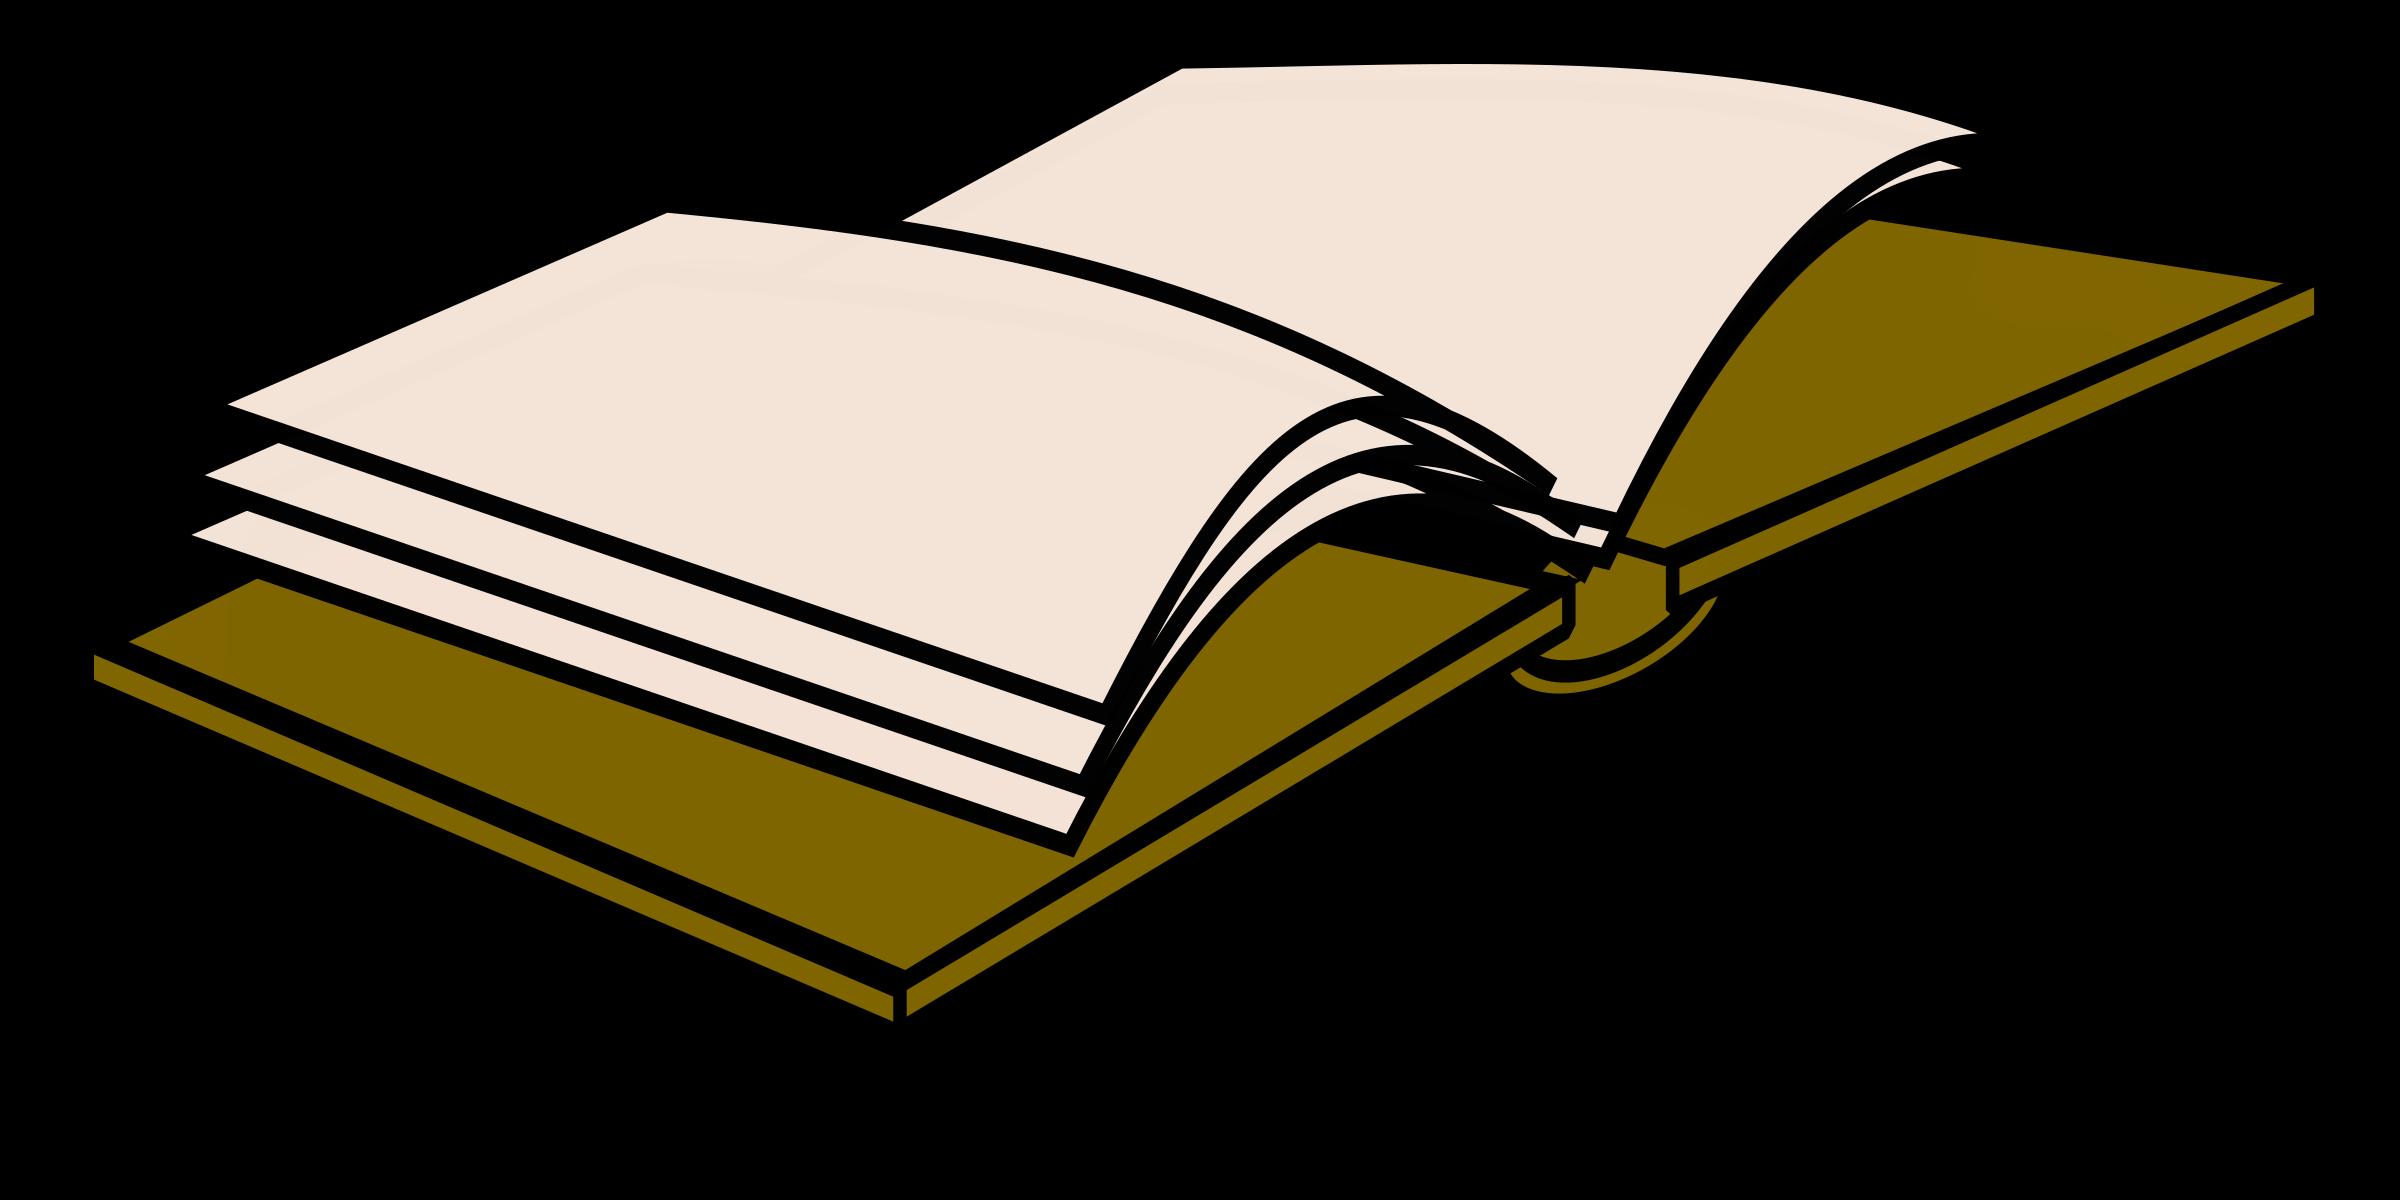 BIG IMAGE (PNG) - Book Gift PNG